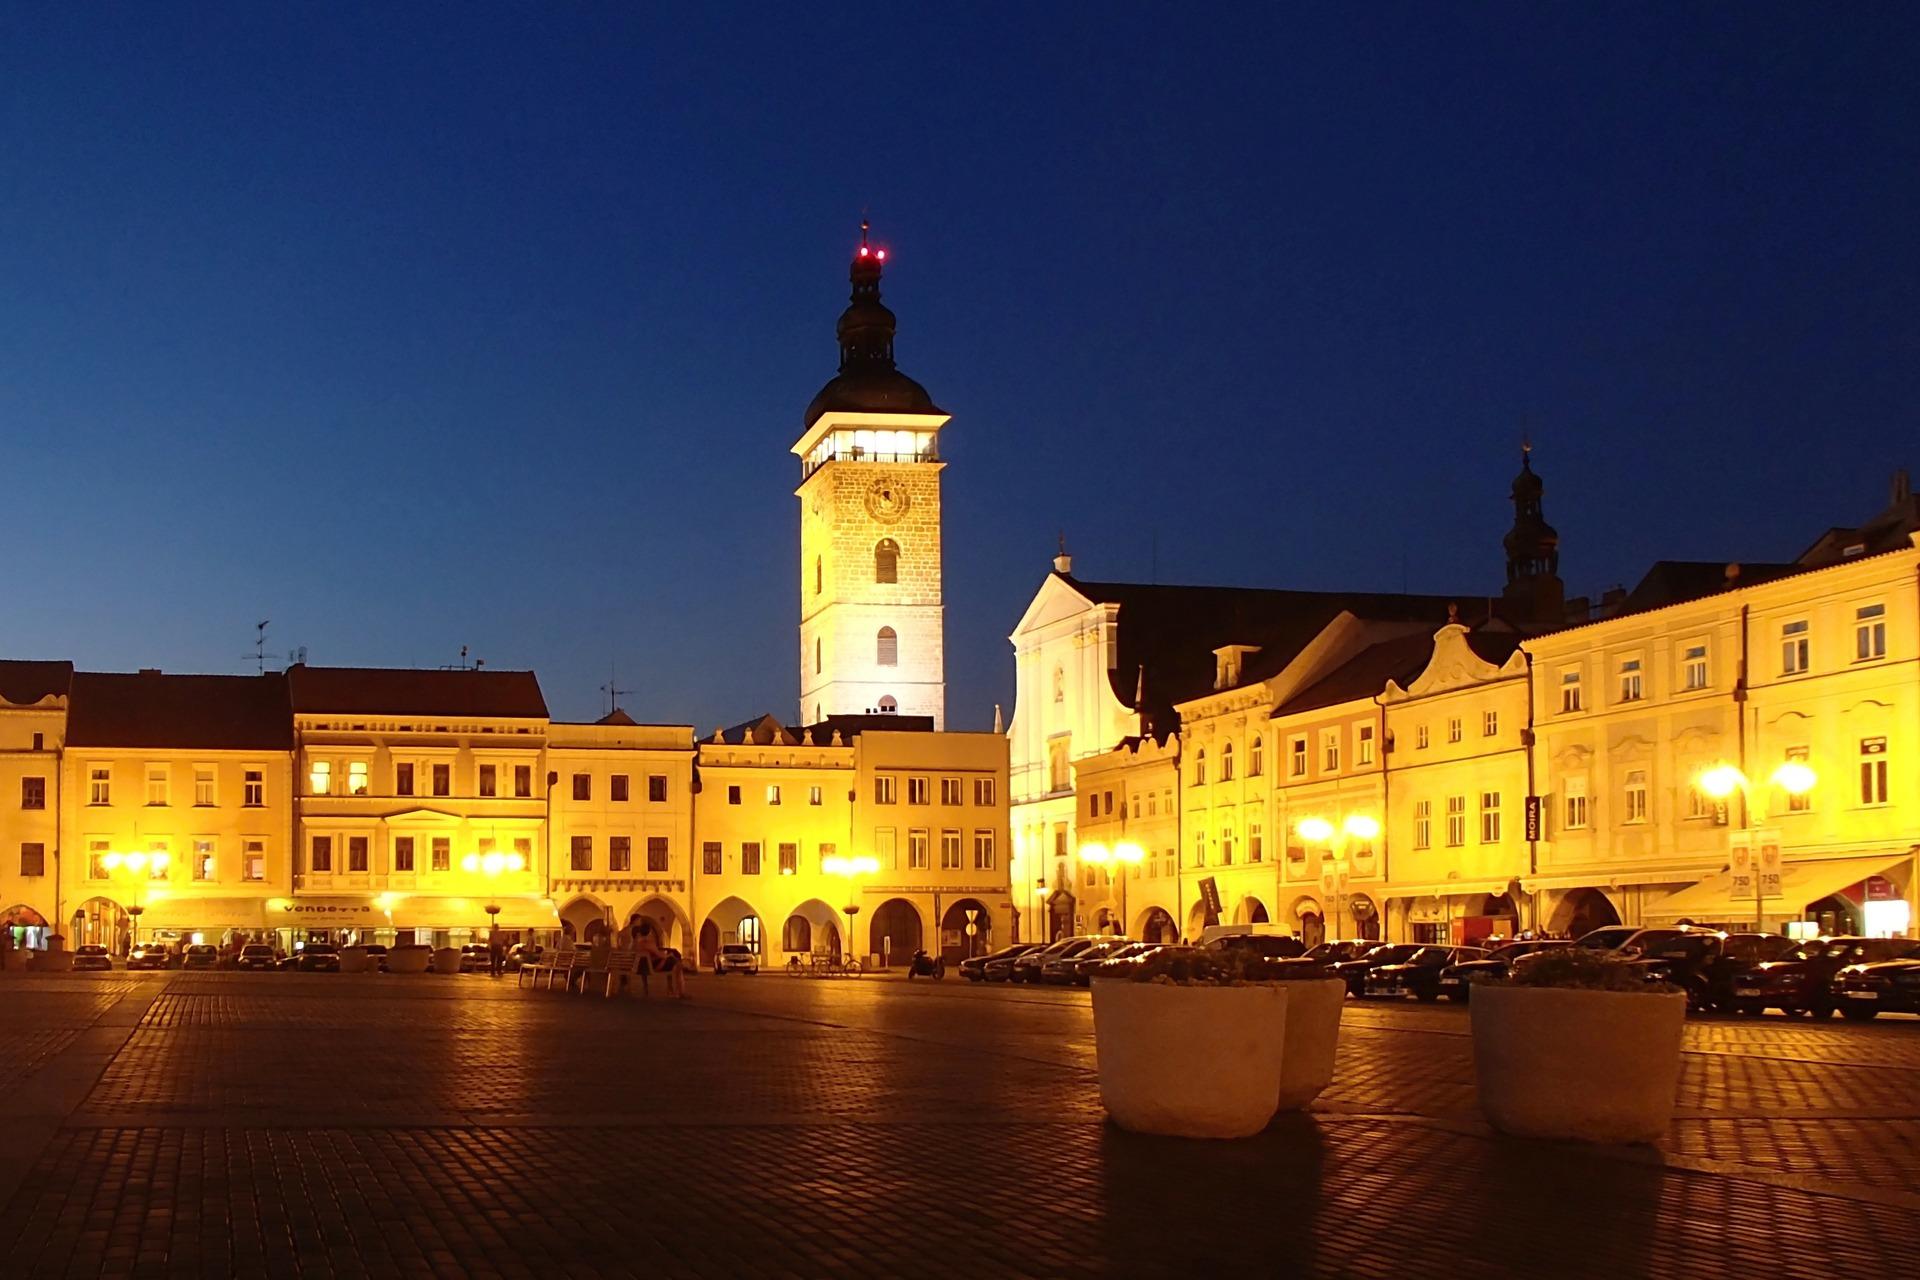 Night view of České Budějovice's main square.